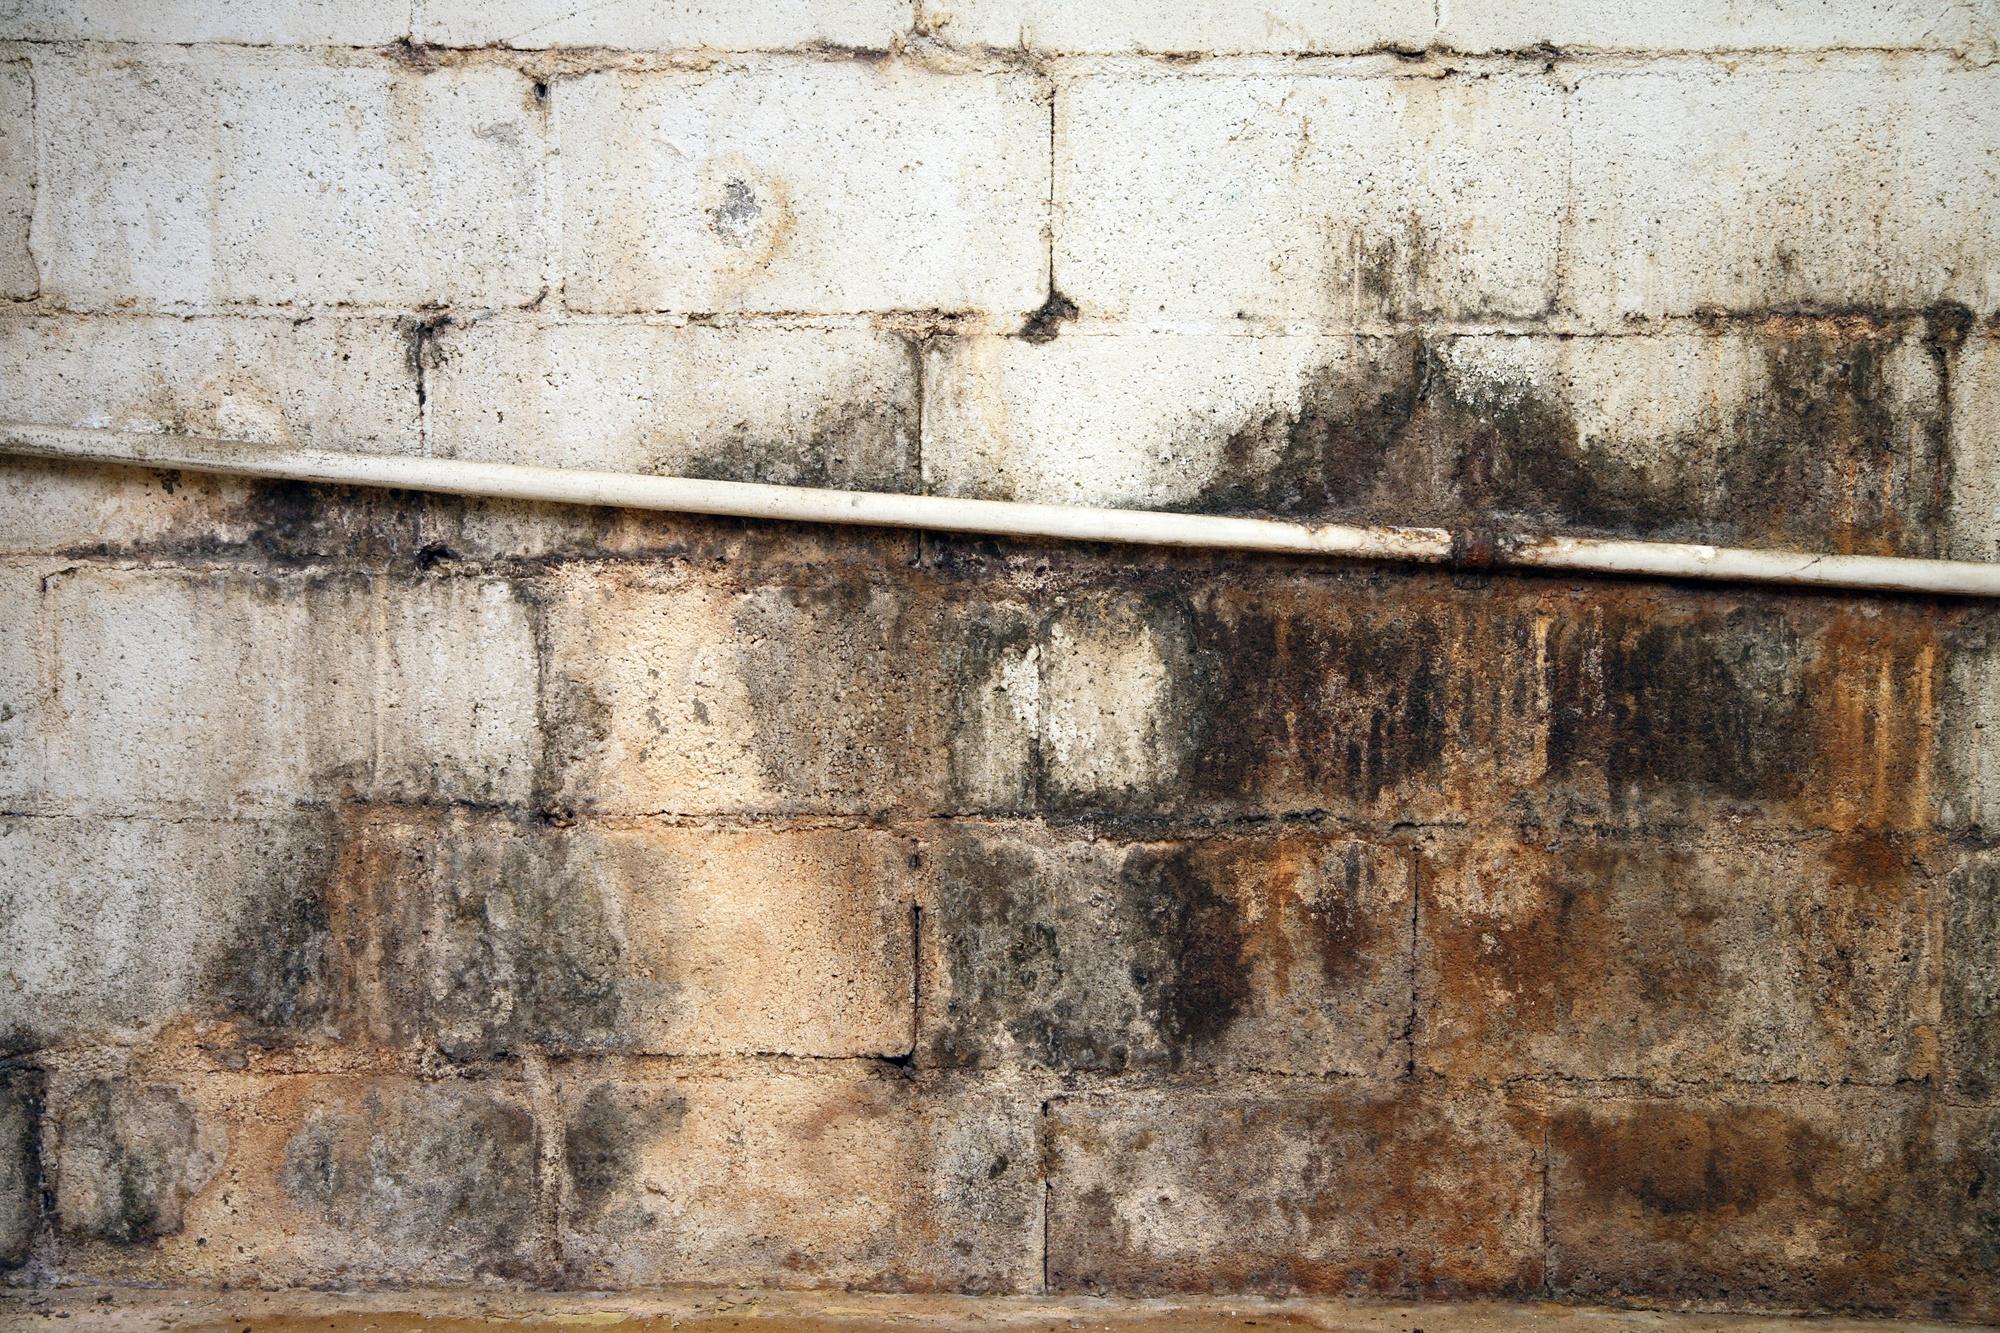 crawl space mold remediation